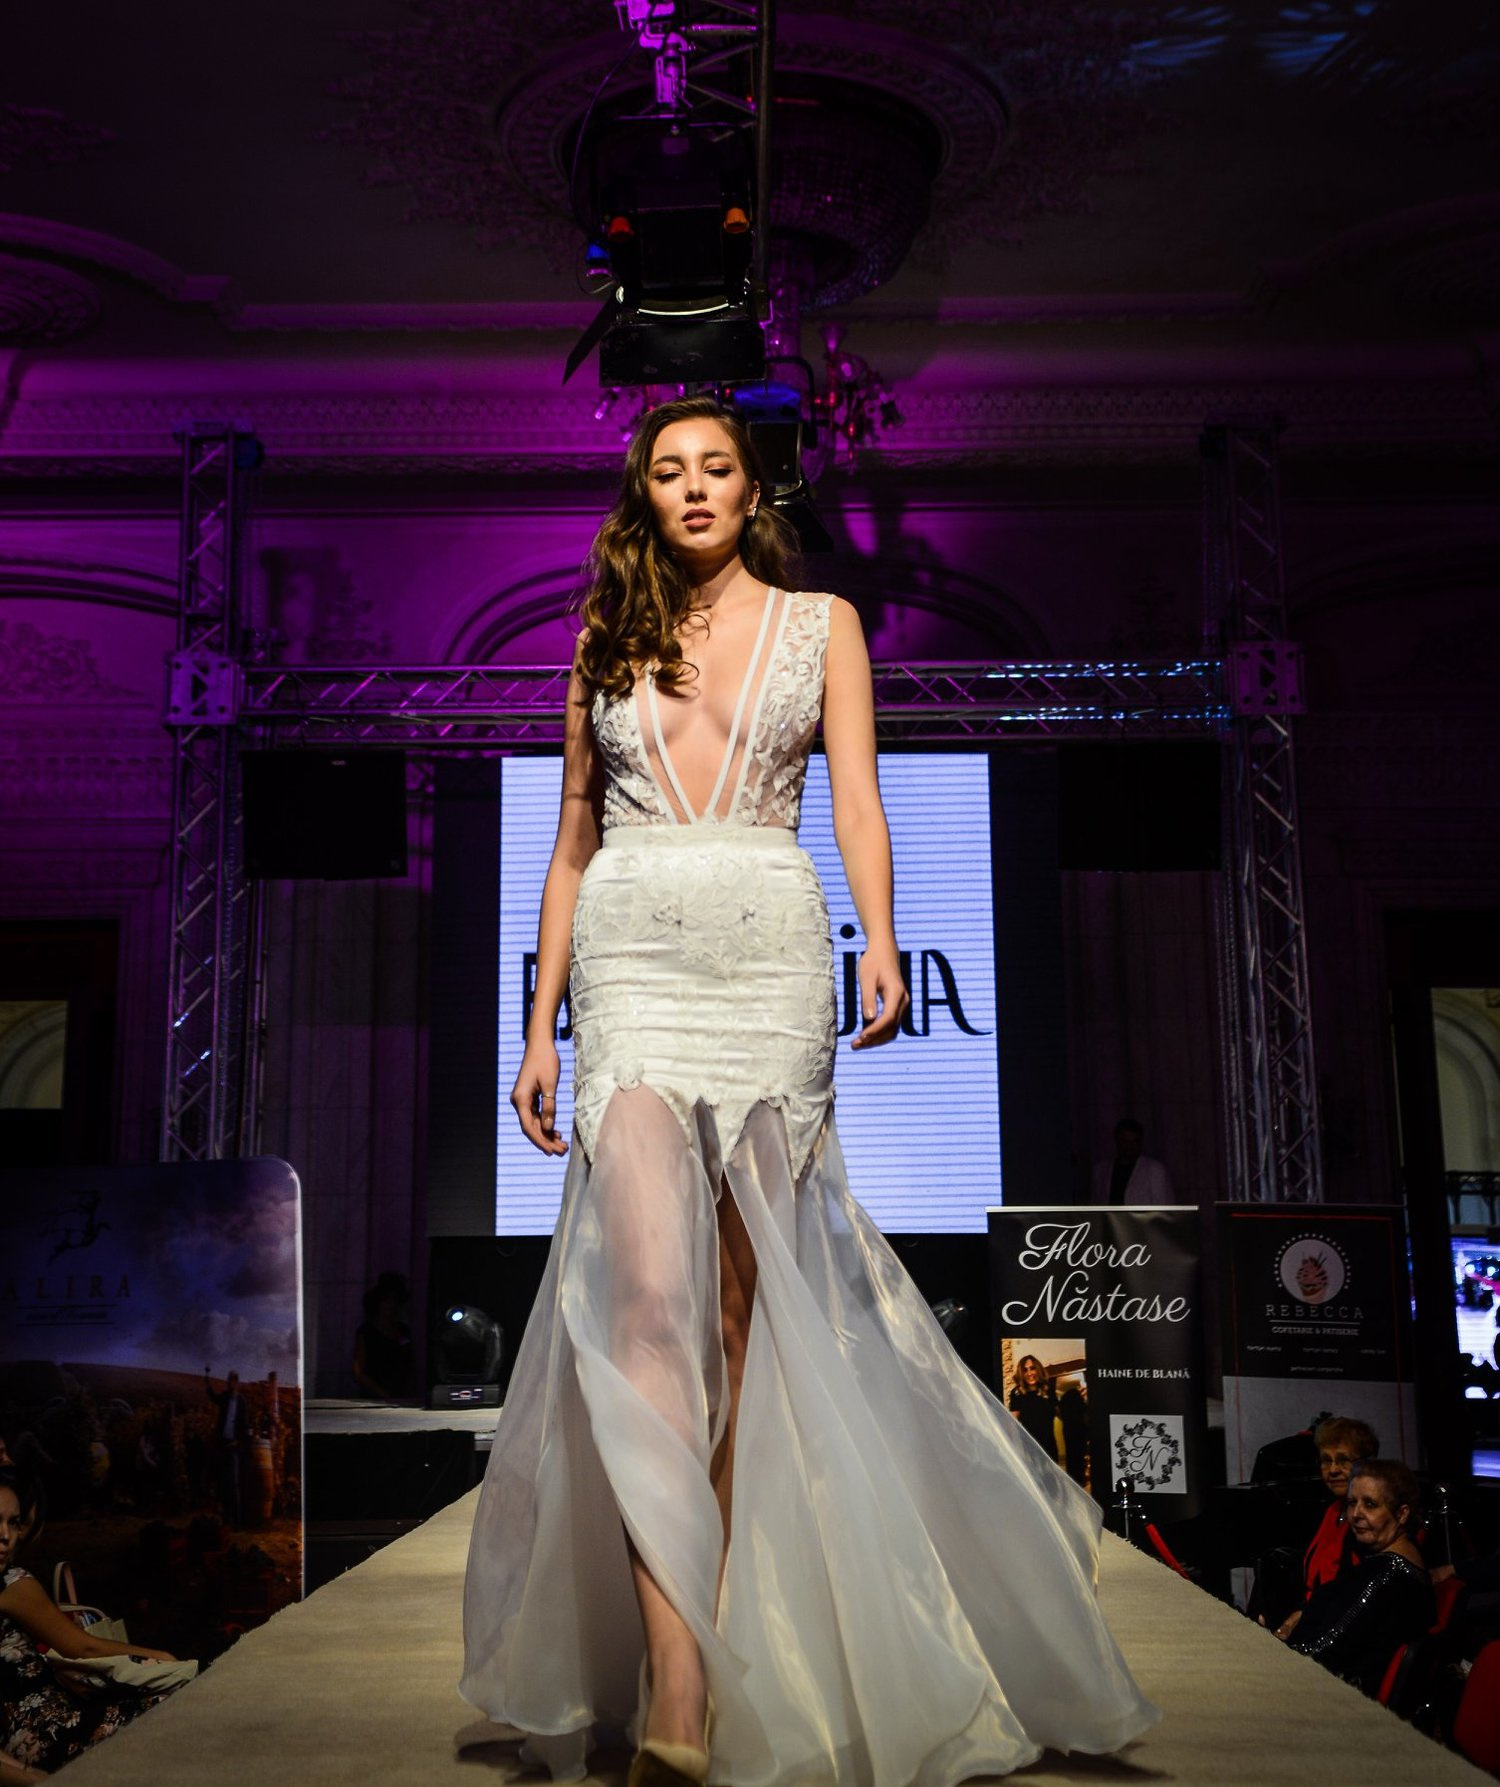 Carmen 2019 wedding dress by Fashion by Laina - See more at www.fashionbylaina.eu